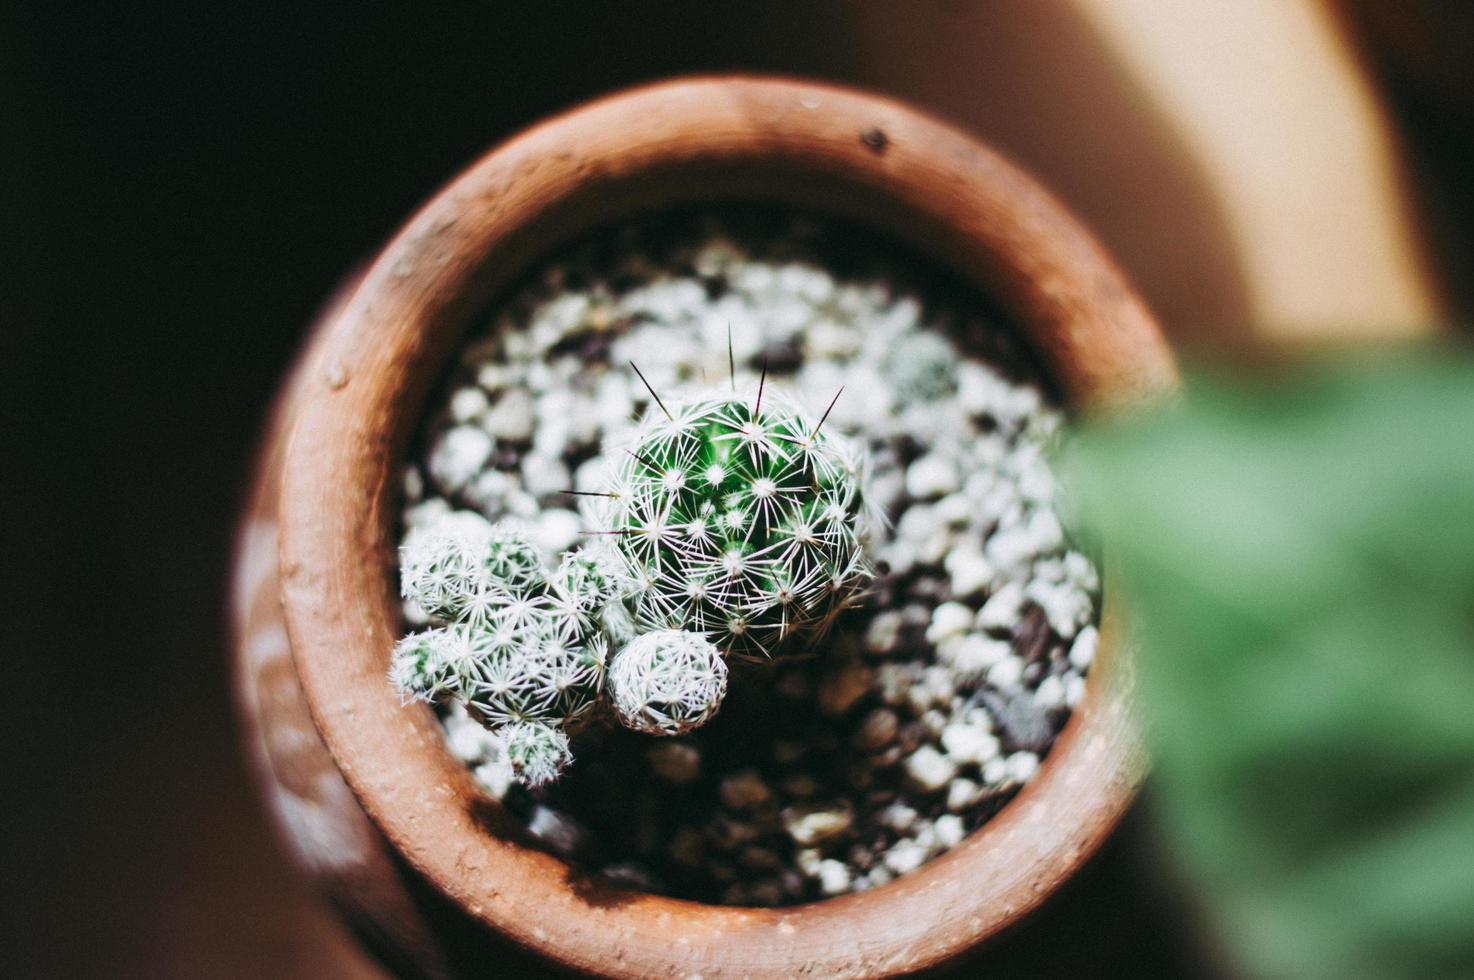 Kaktustopf, Draufsicht foto